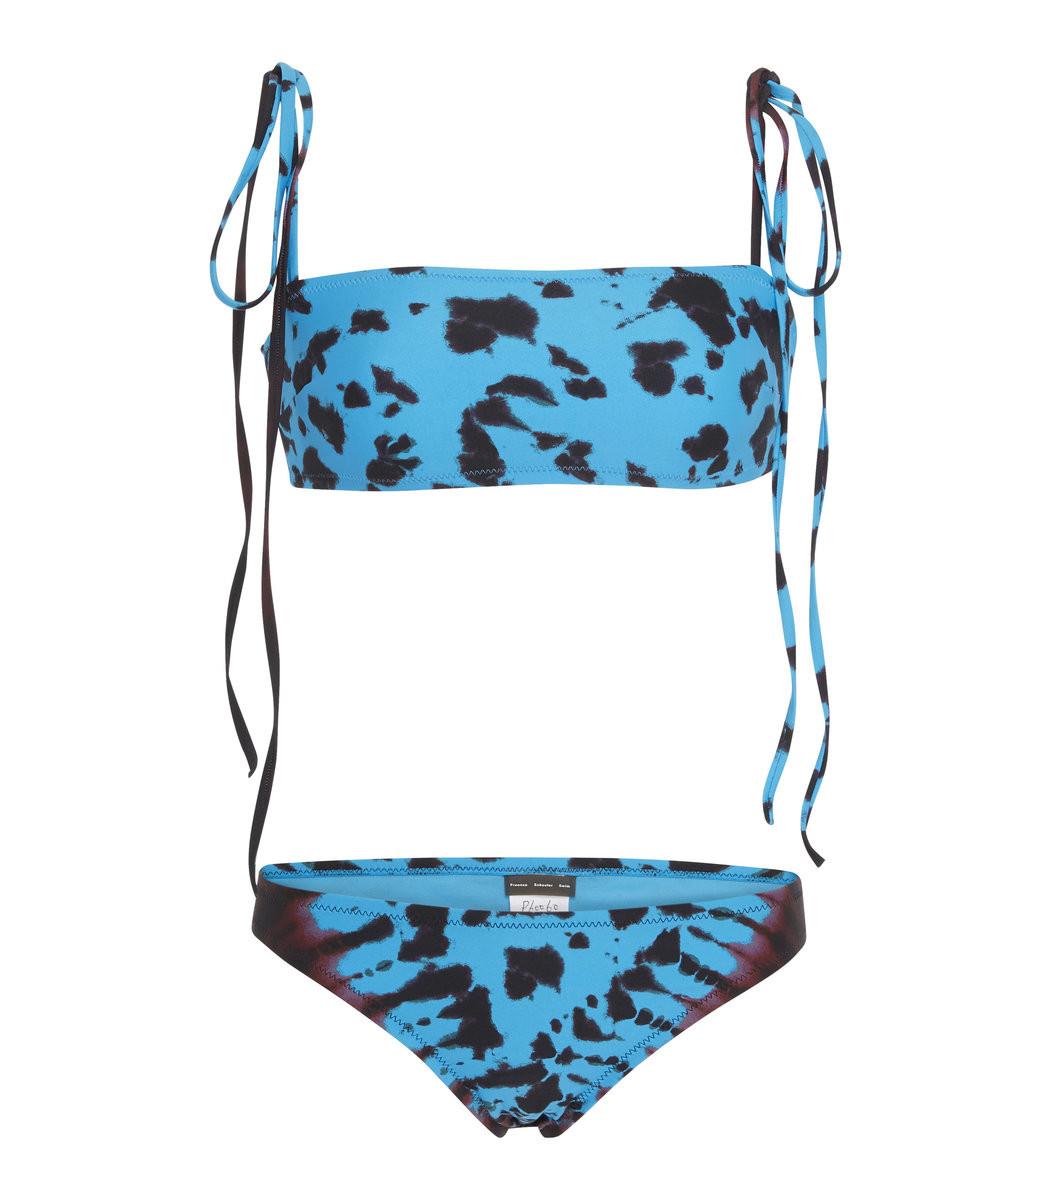 5f98adaee1 Home   Proenza Schouler   Tie-Dyed Bandeau Bikini Set. prev